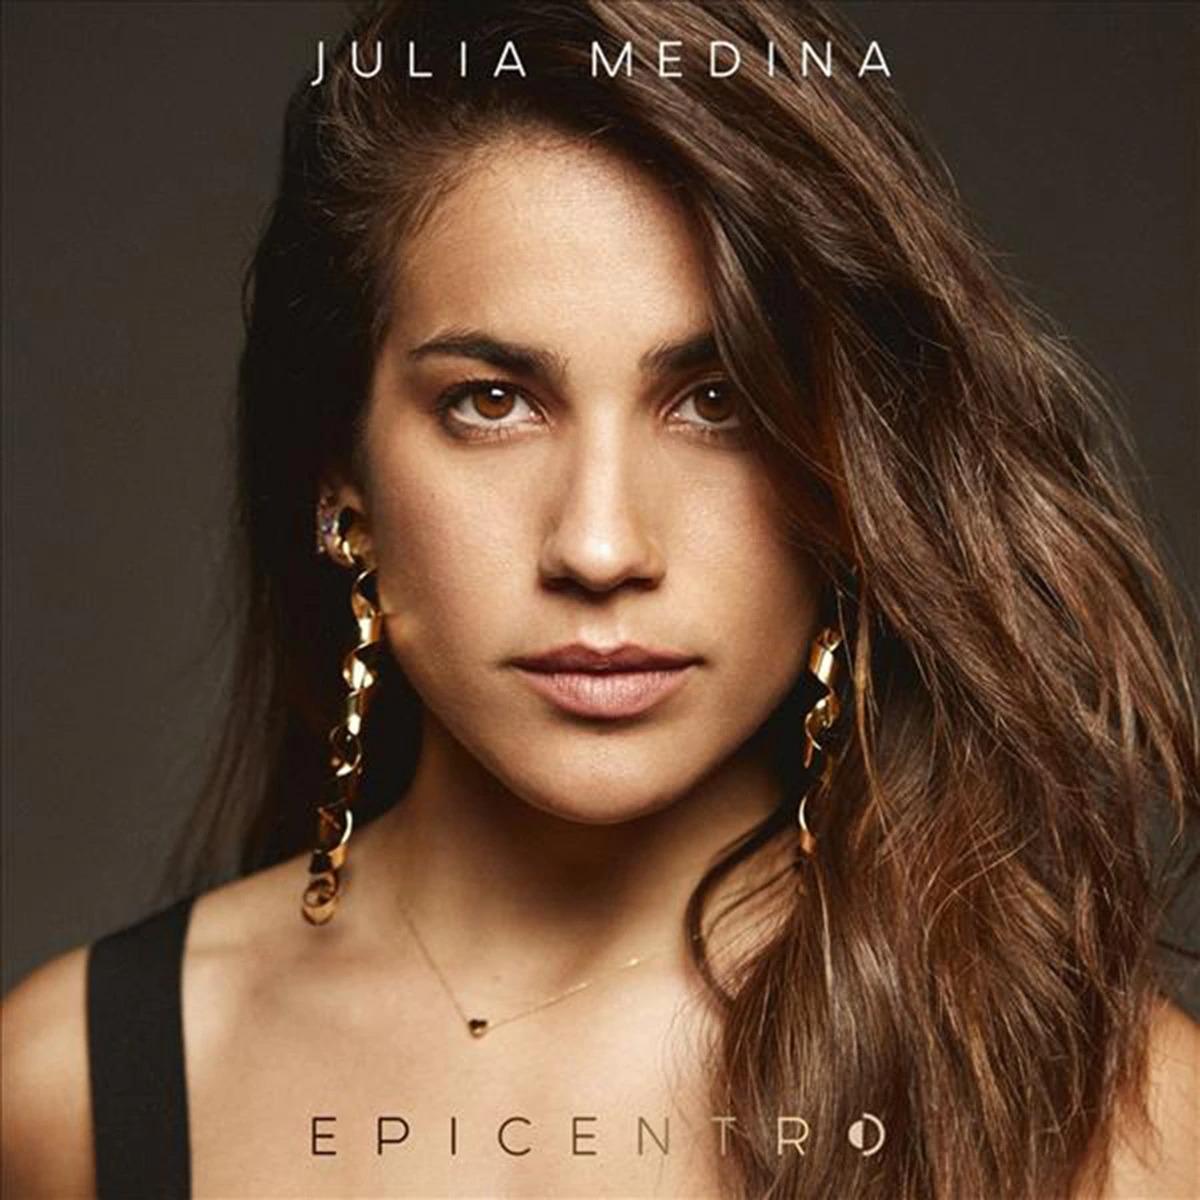 EPICENTRO (CD)